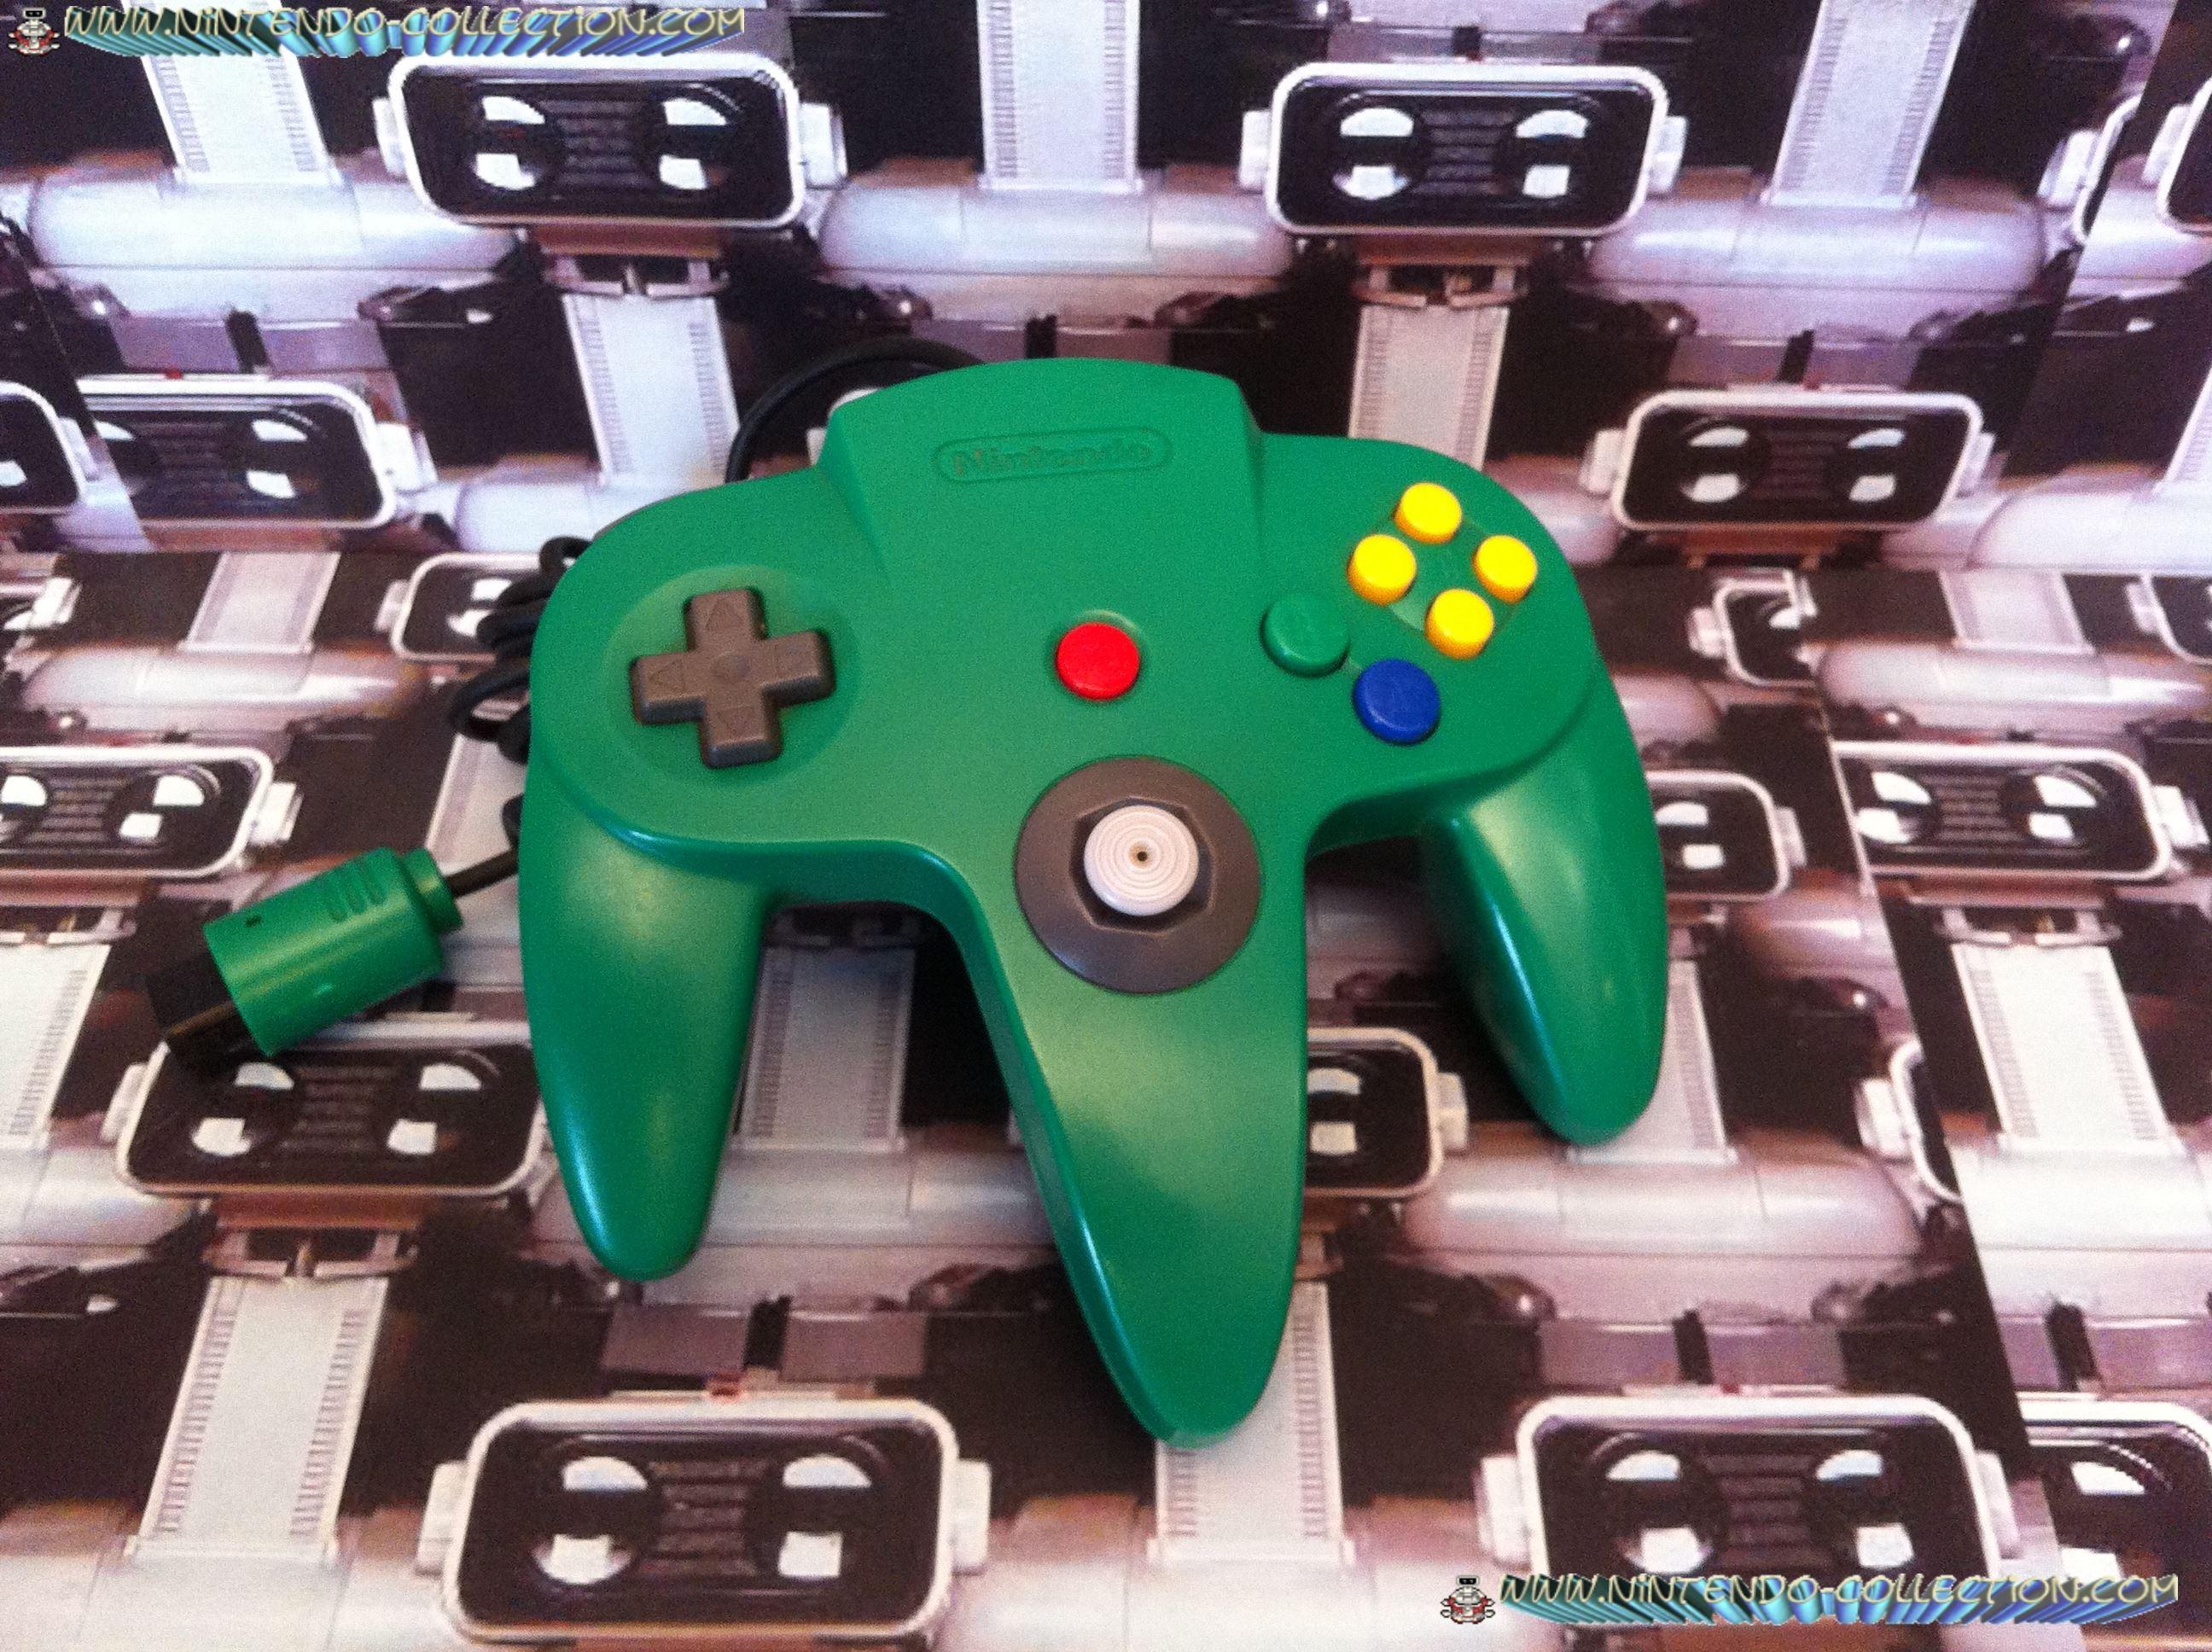 www.nintendo-collection.com  - Nintendo N64 Controller green - Manette  verte.jpg